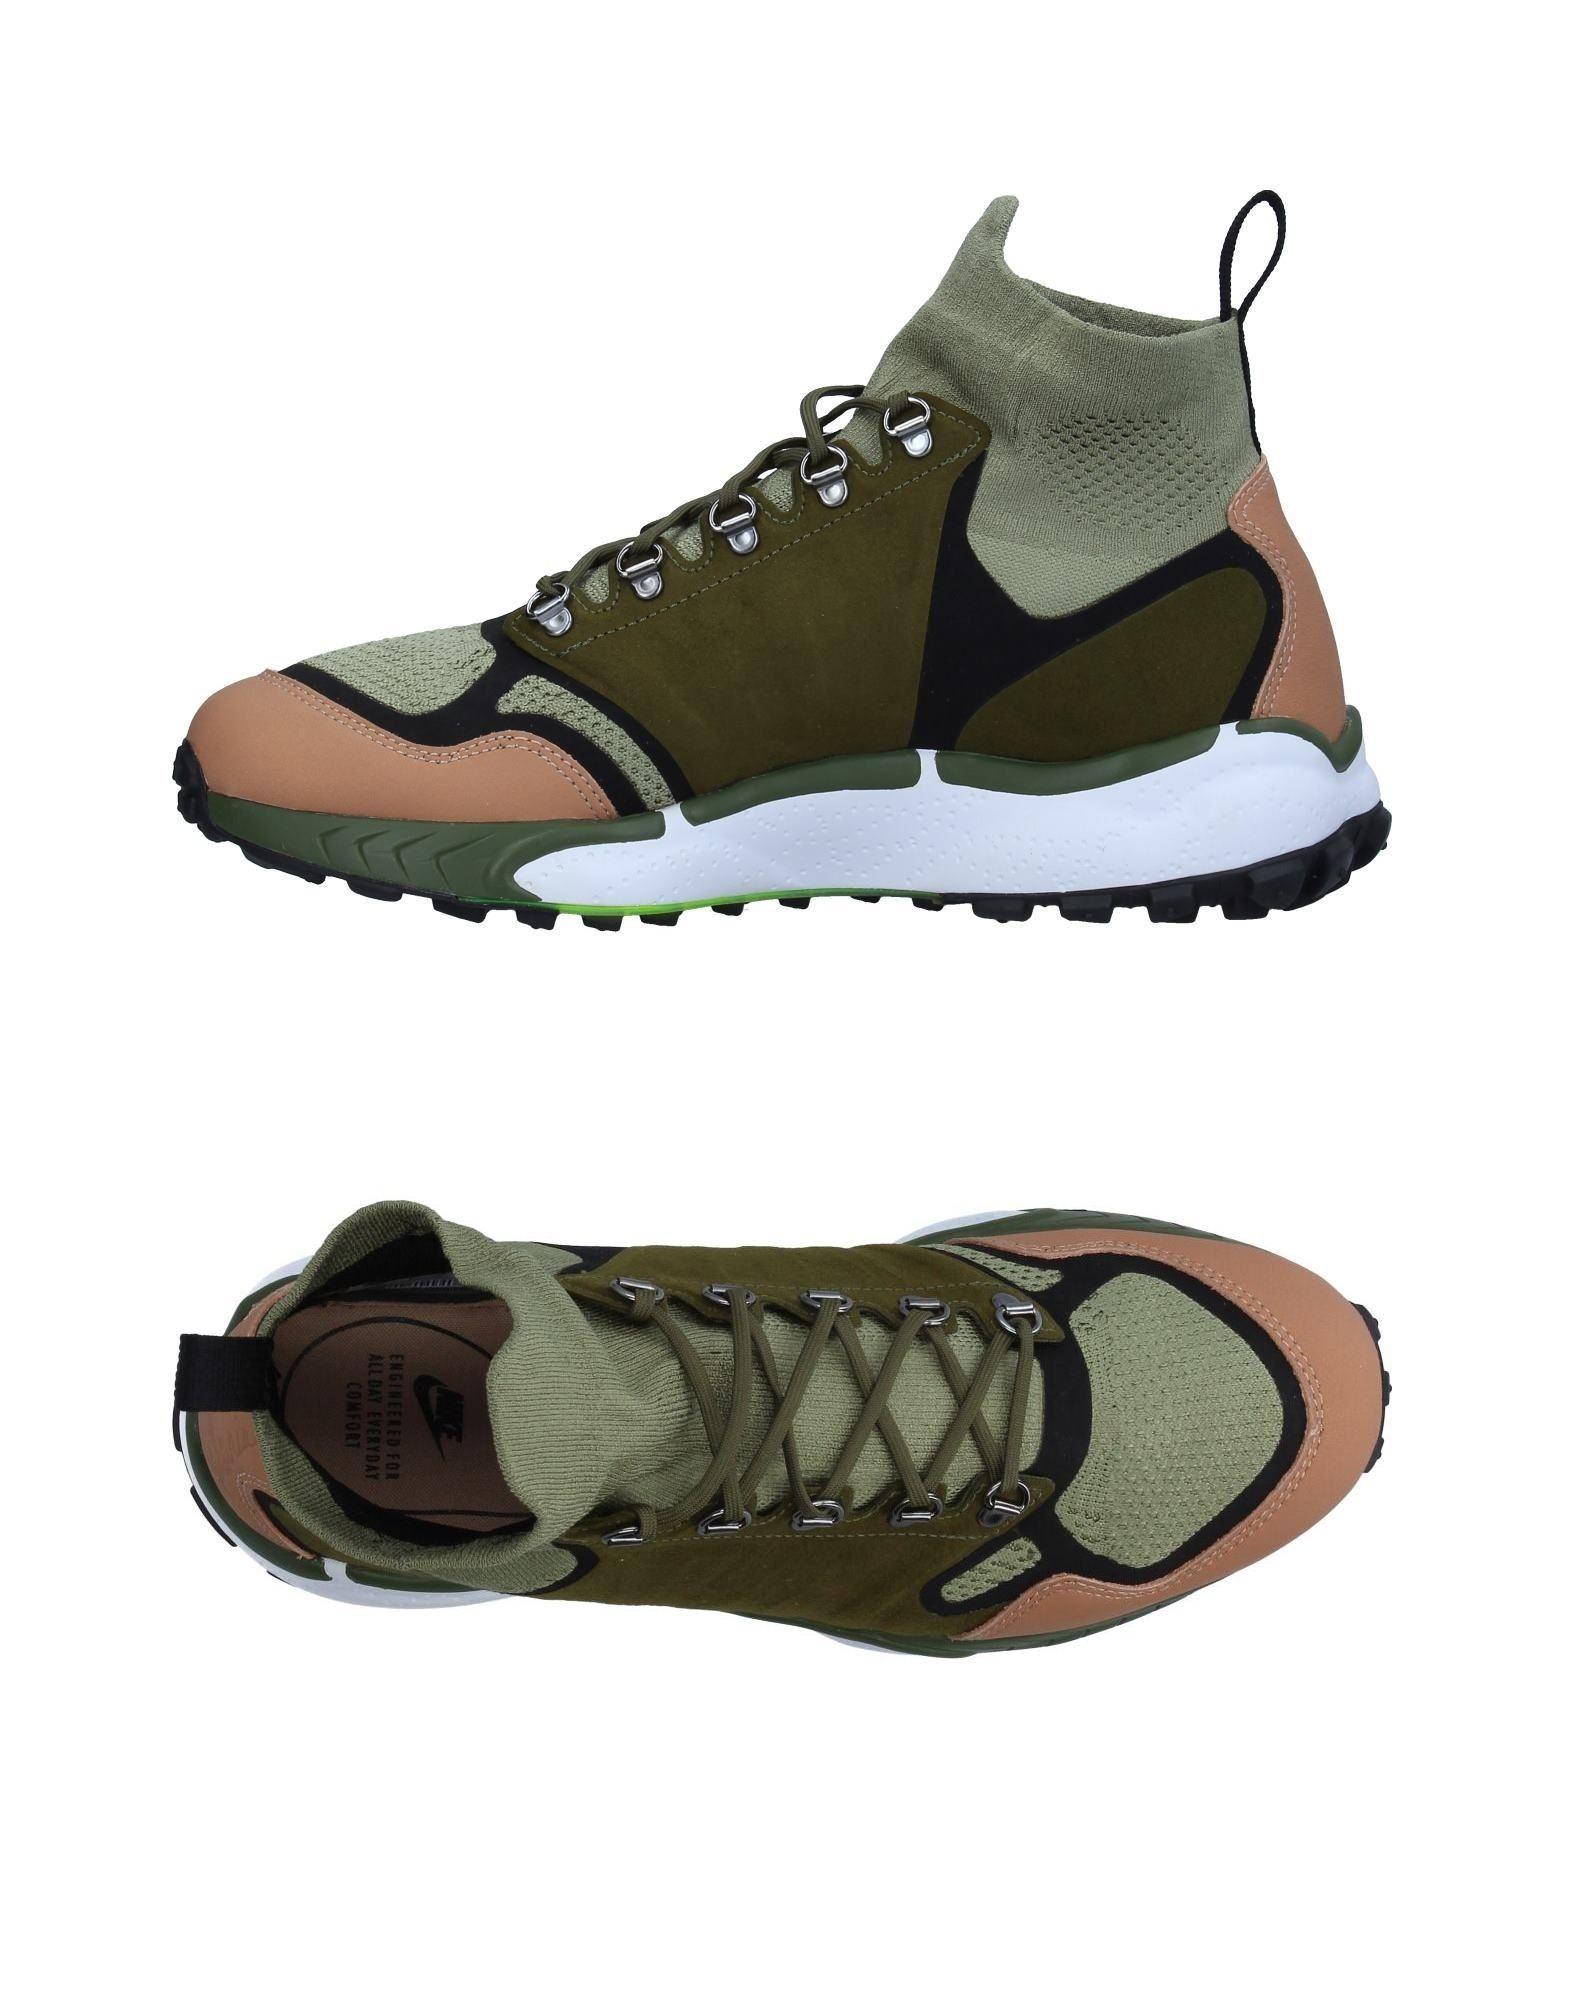 Moda Scarpe da Uomo Ginnastica Nike Uomo da - 11335613PN 1b5a62